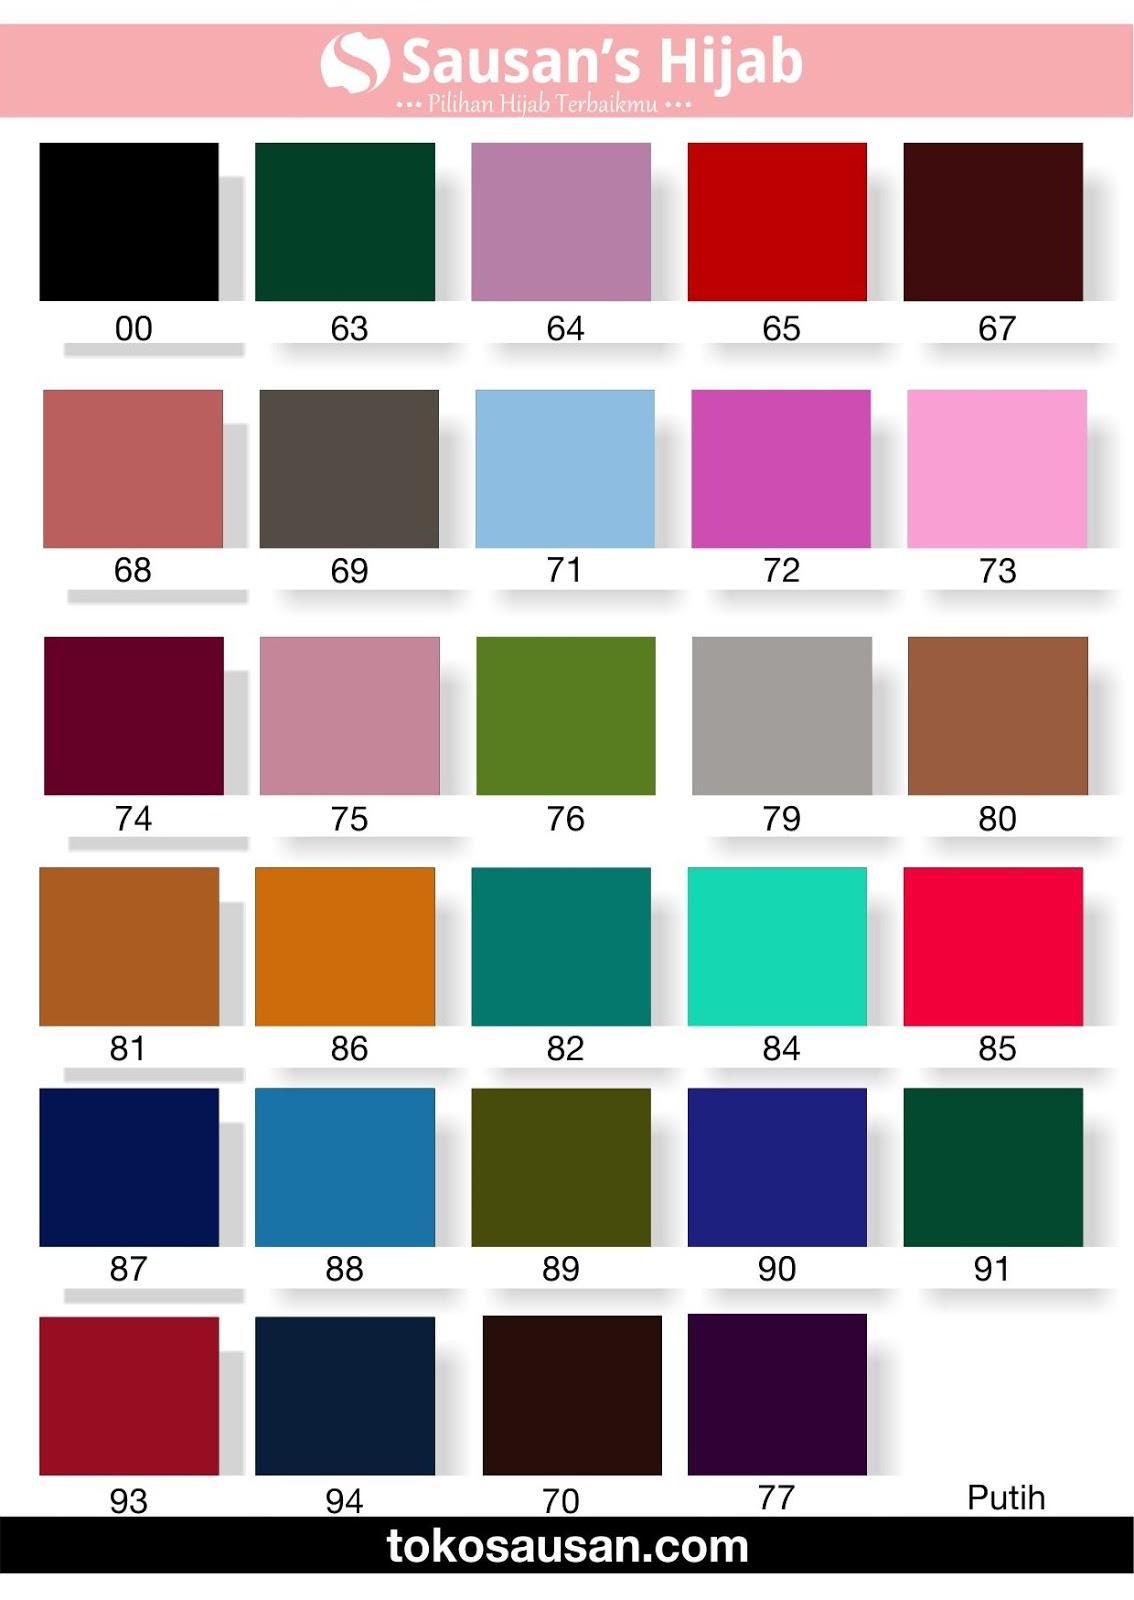 katalog lengkap warna bahan wolfis sausan jilbab bekasi. Black Bedroom Furniture Sets. Home Design Ideas